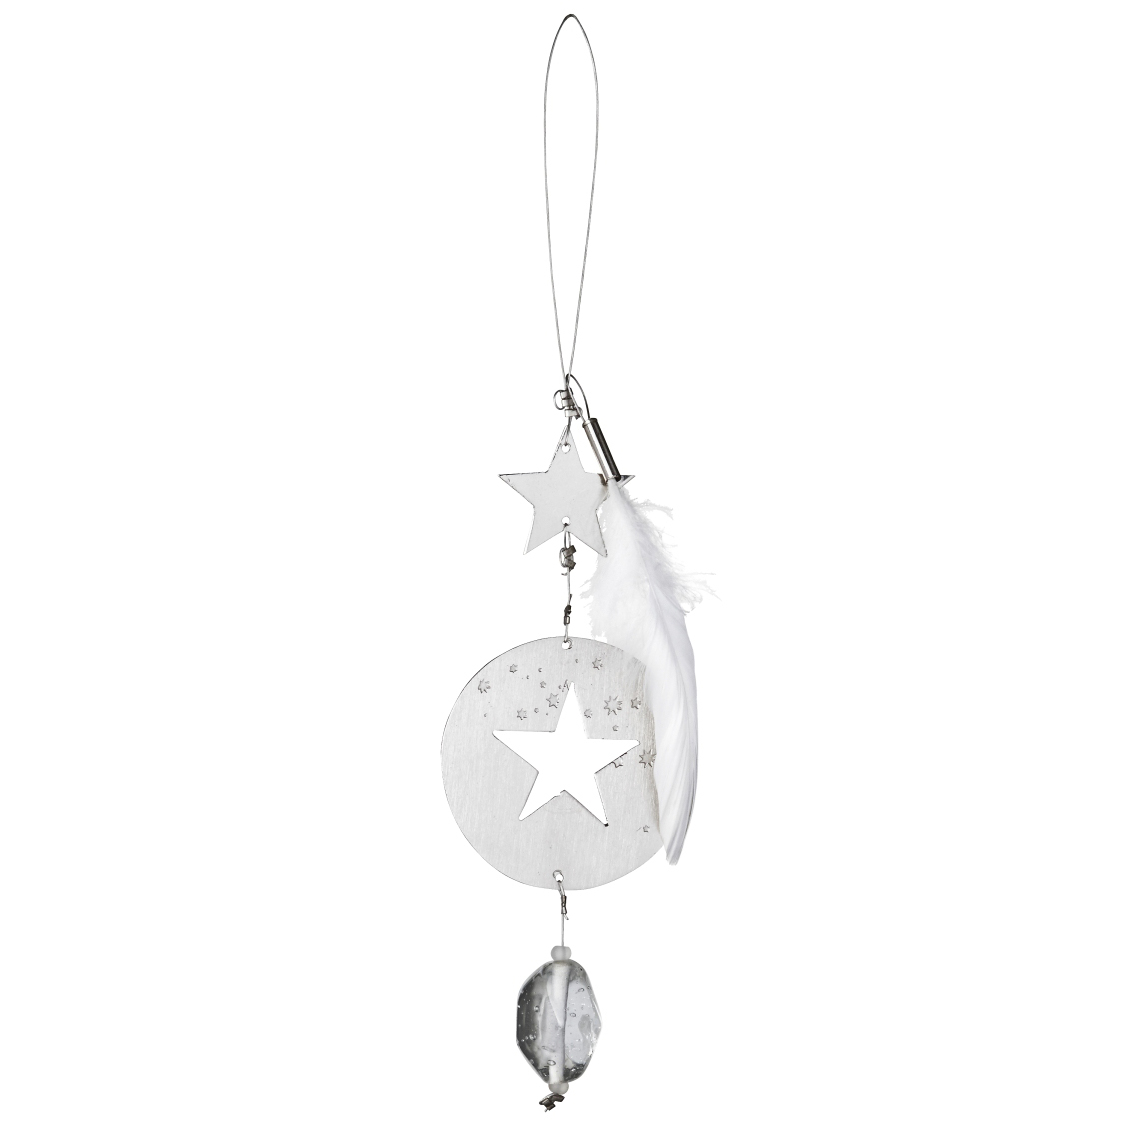 Eisstern-Ornament - räder (Xmas)